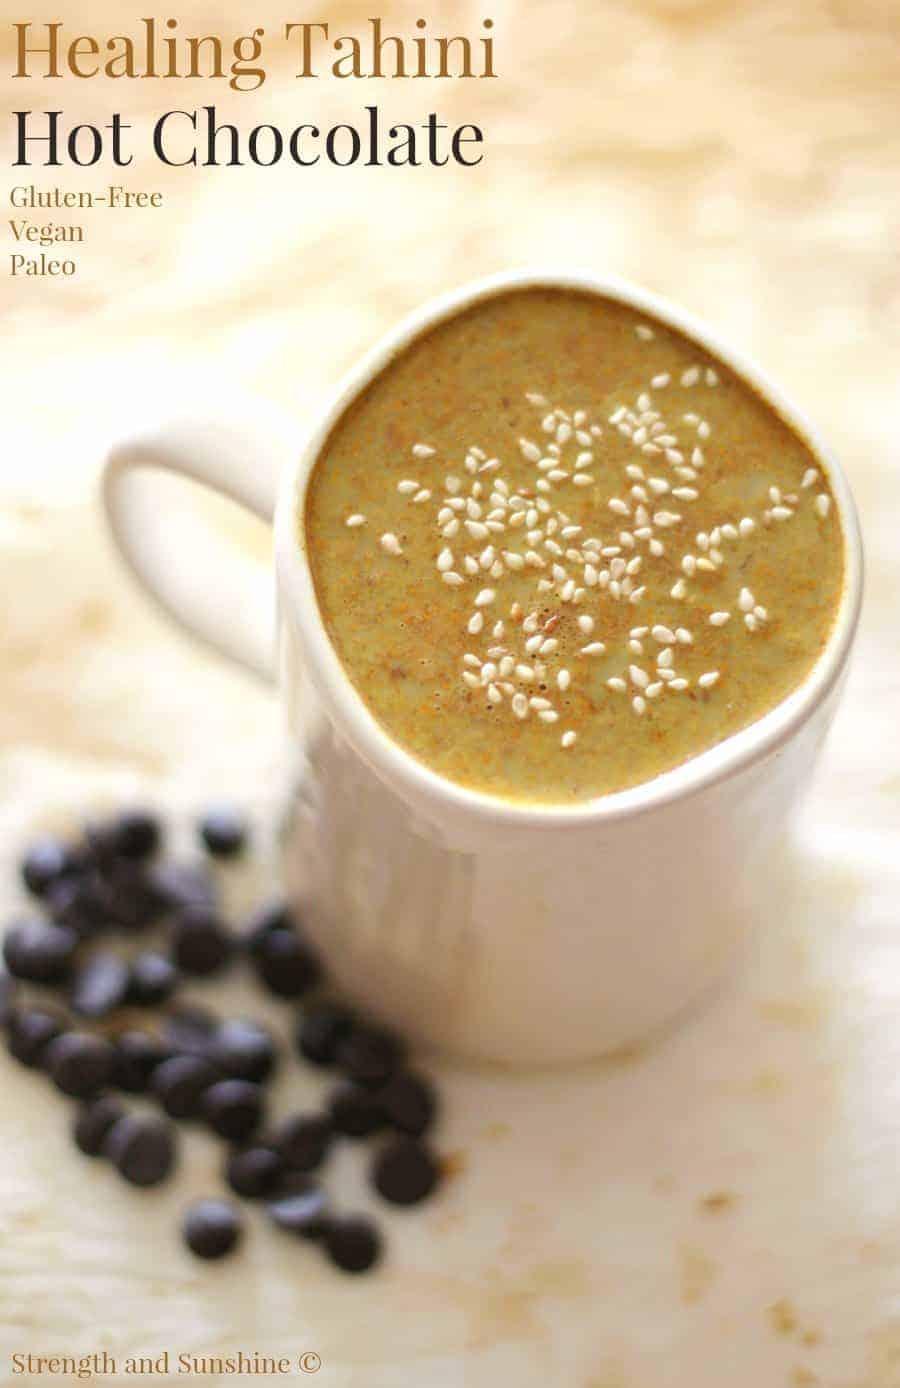 Healing-Tahini-Hot-Chocolate